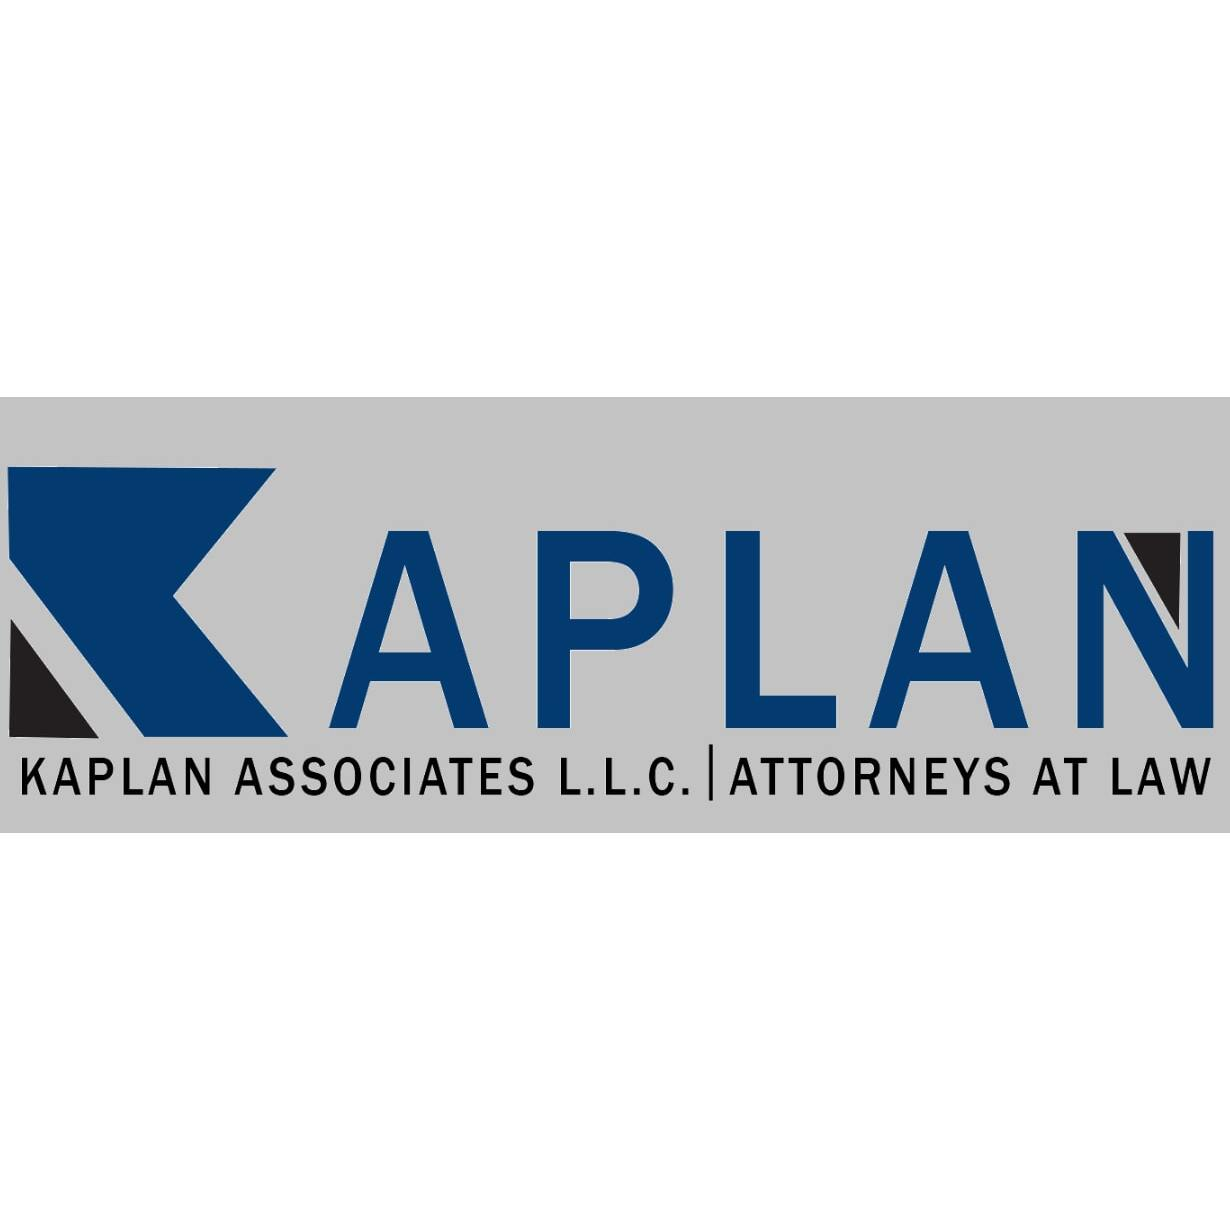 Kaplan Associates LLC